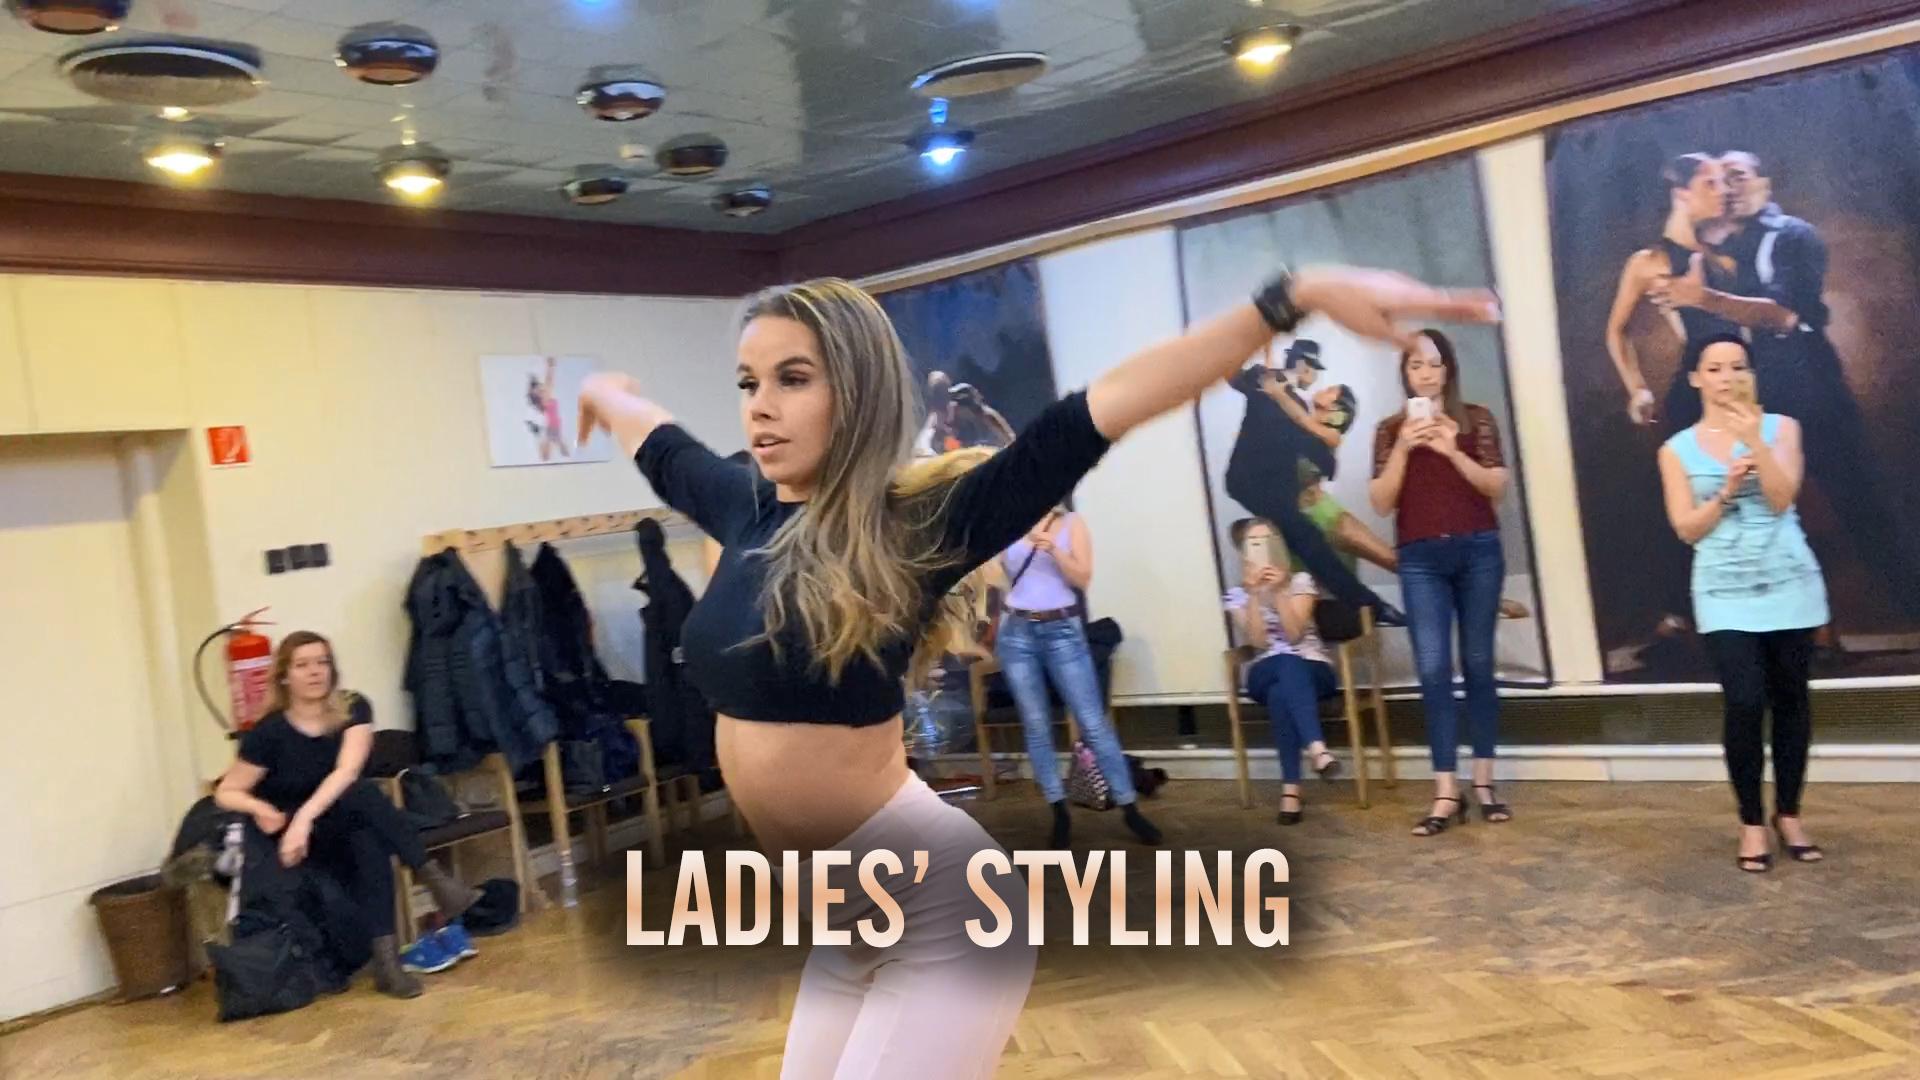 Ladies' Styling